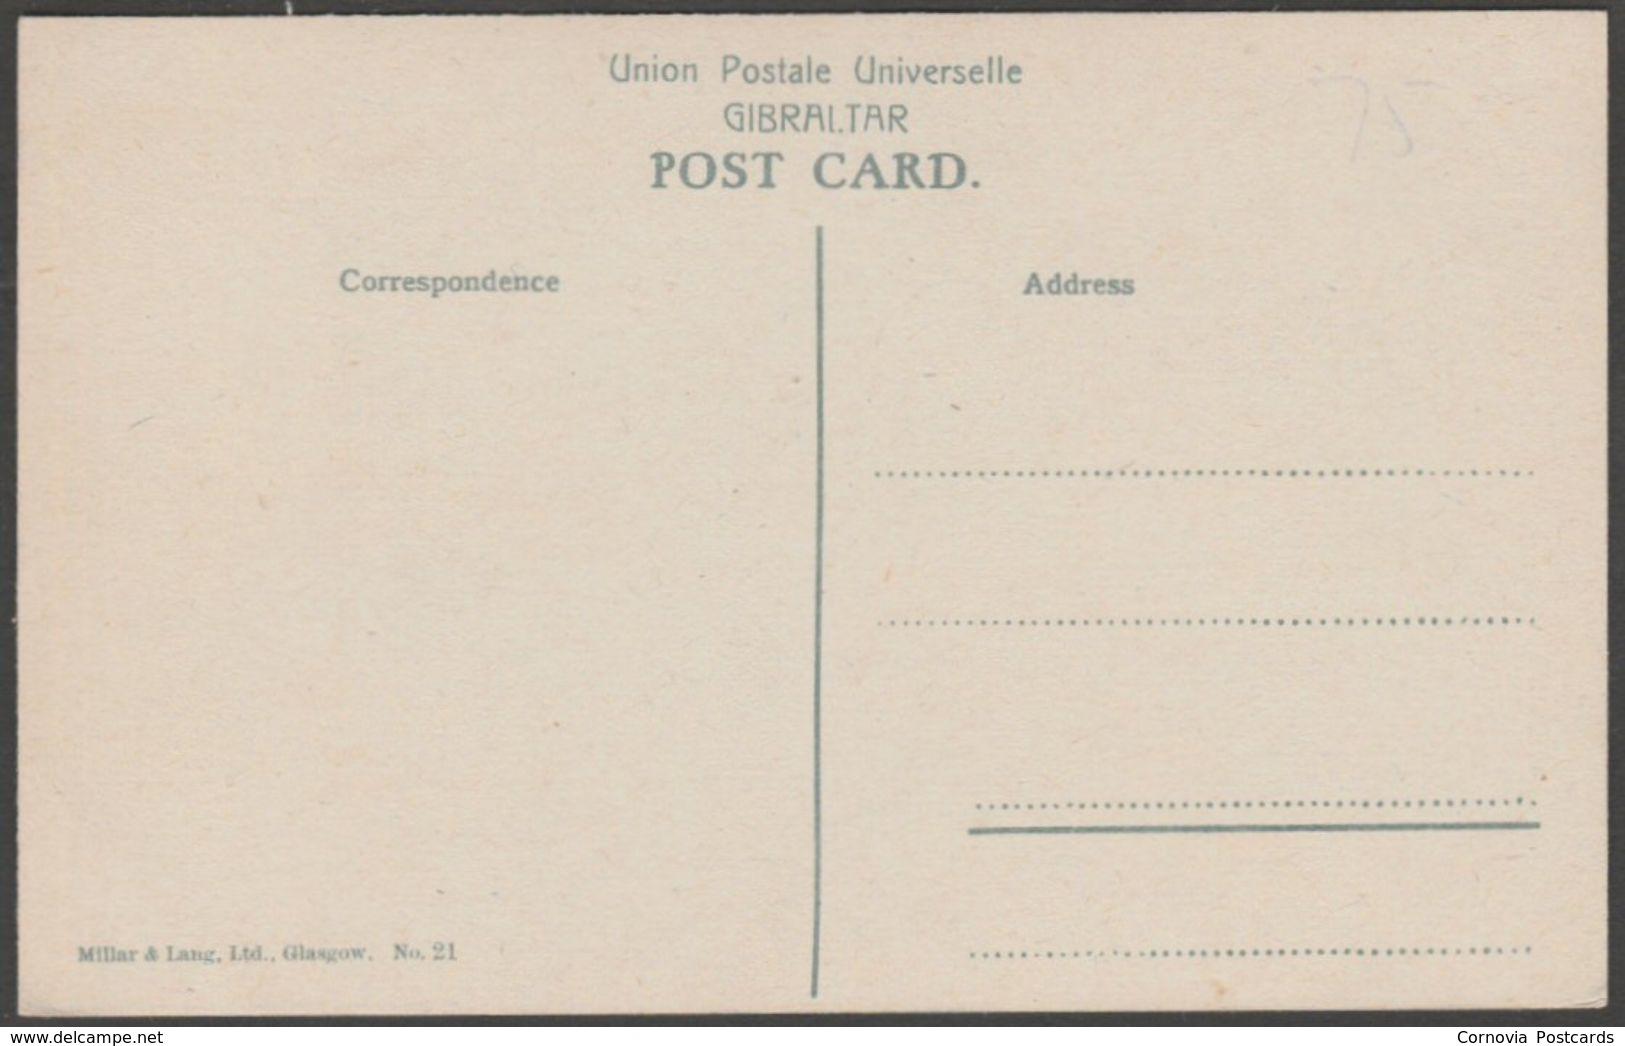 Casemates Barracks, Gibraltar, C.1905 - Millar & Lang Postcard - Gibraltar